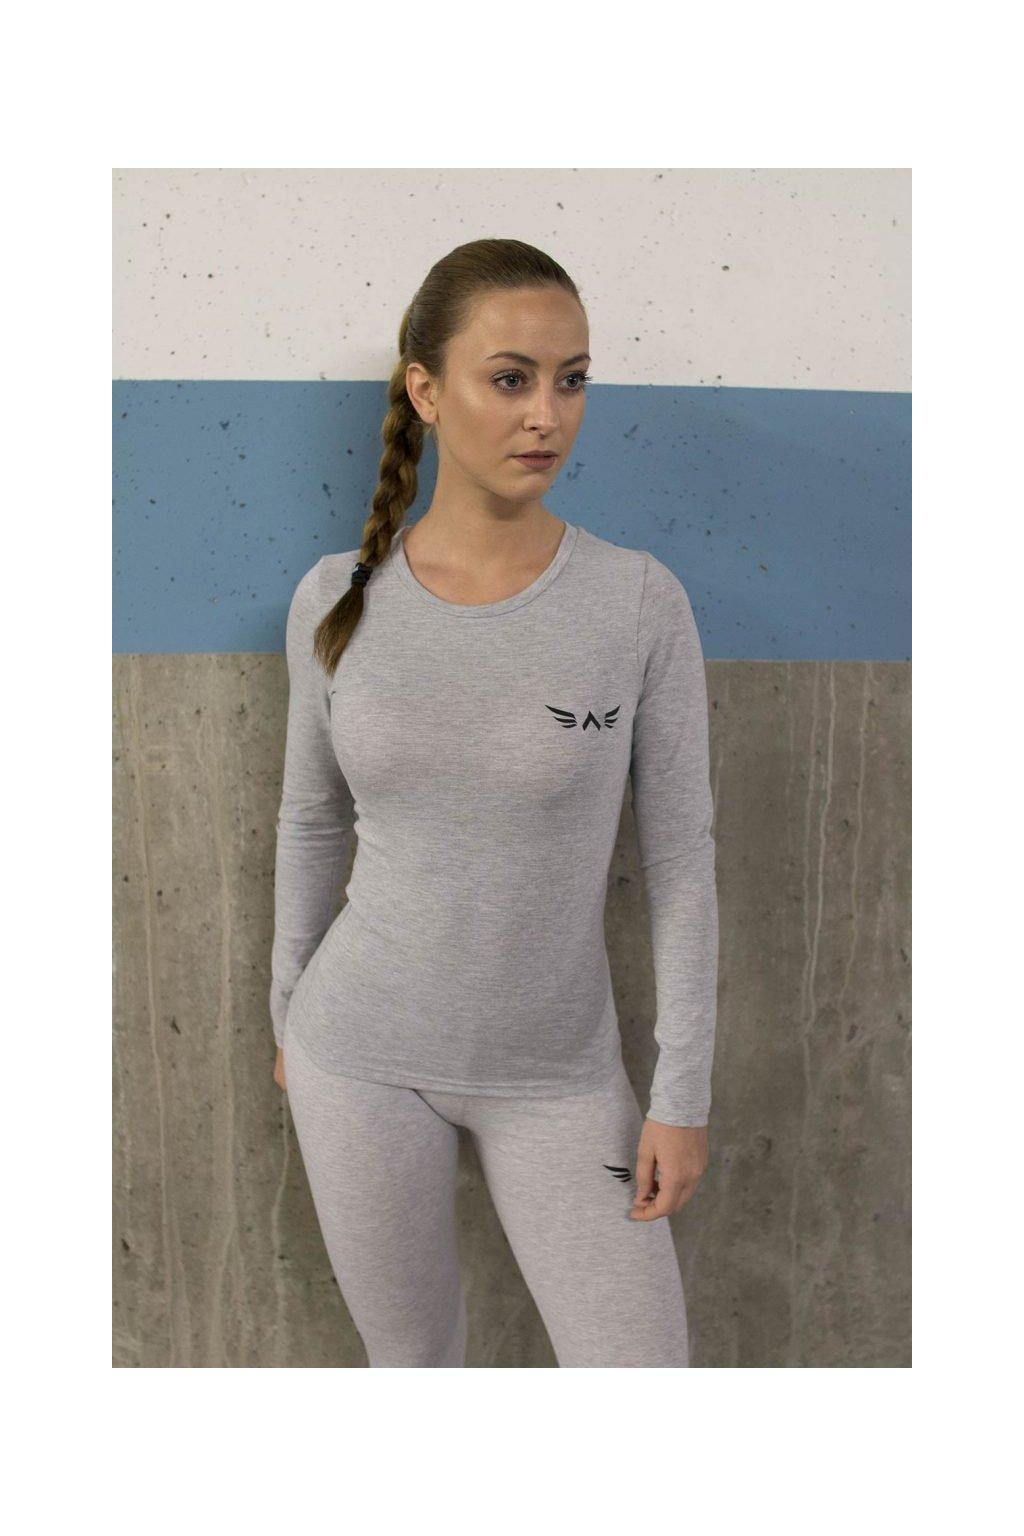 Exalted X1 dámske tričko s dlhým rukávom sivé